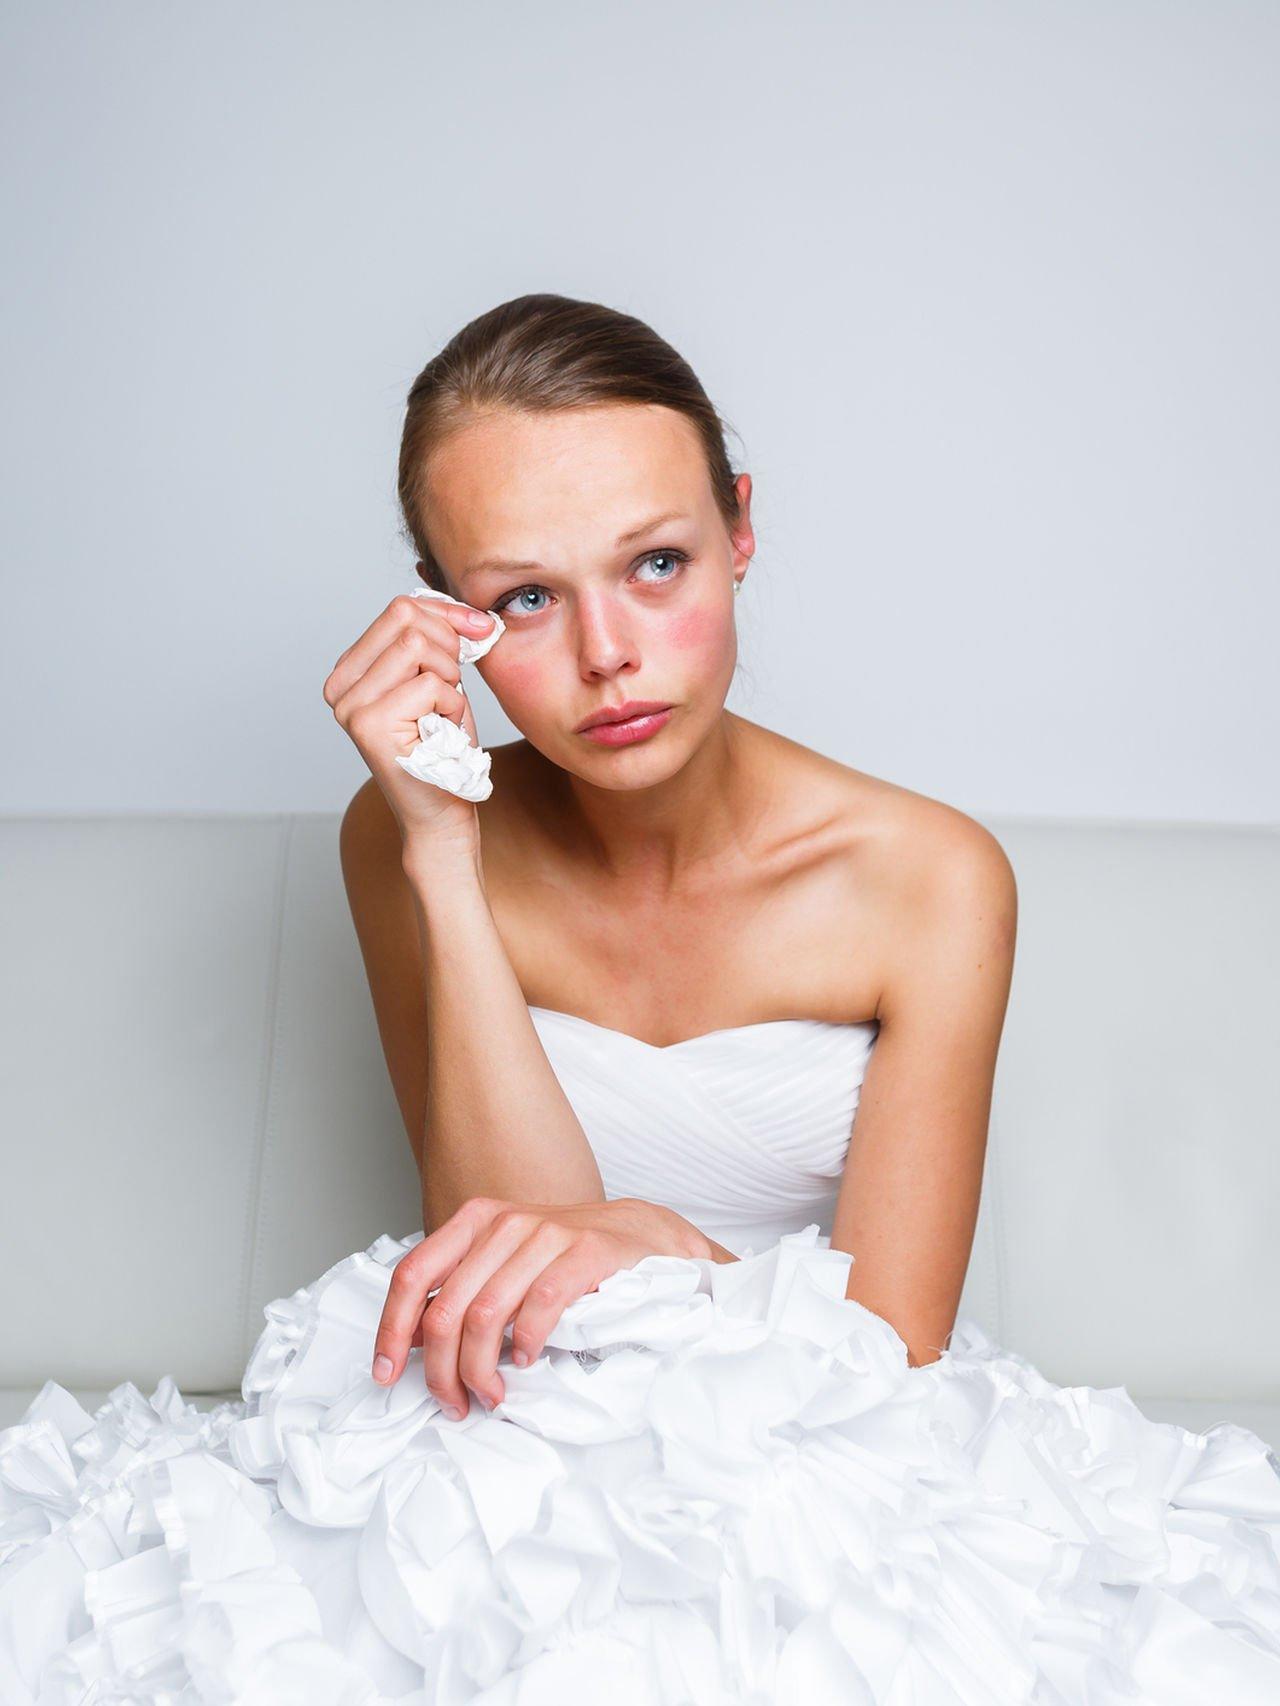 Ser mujer soltera sexo sudados tarapoto